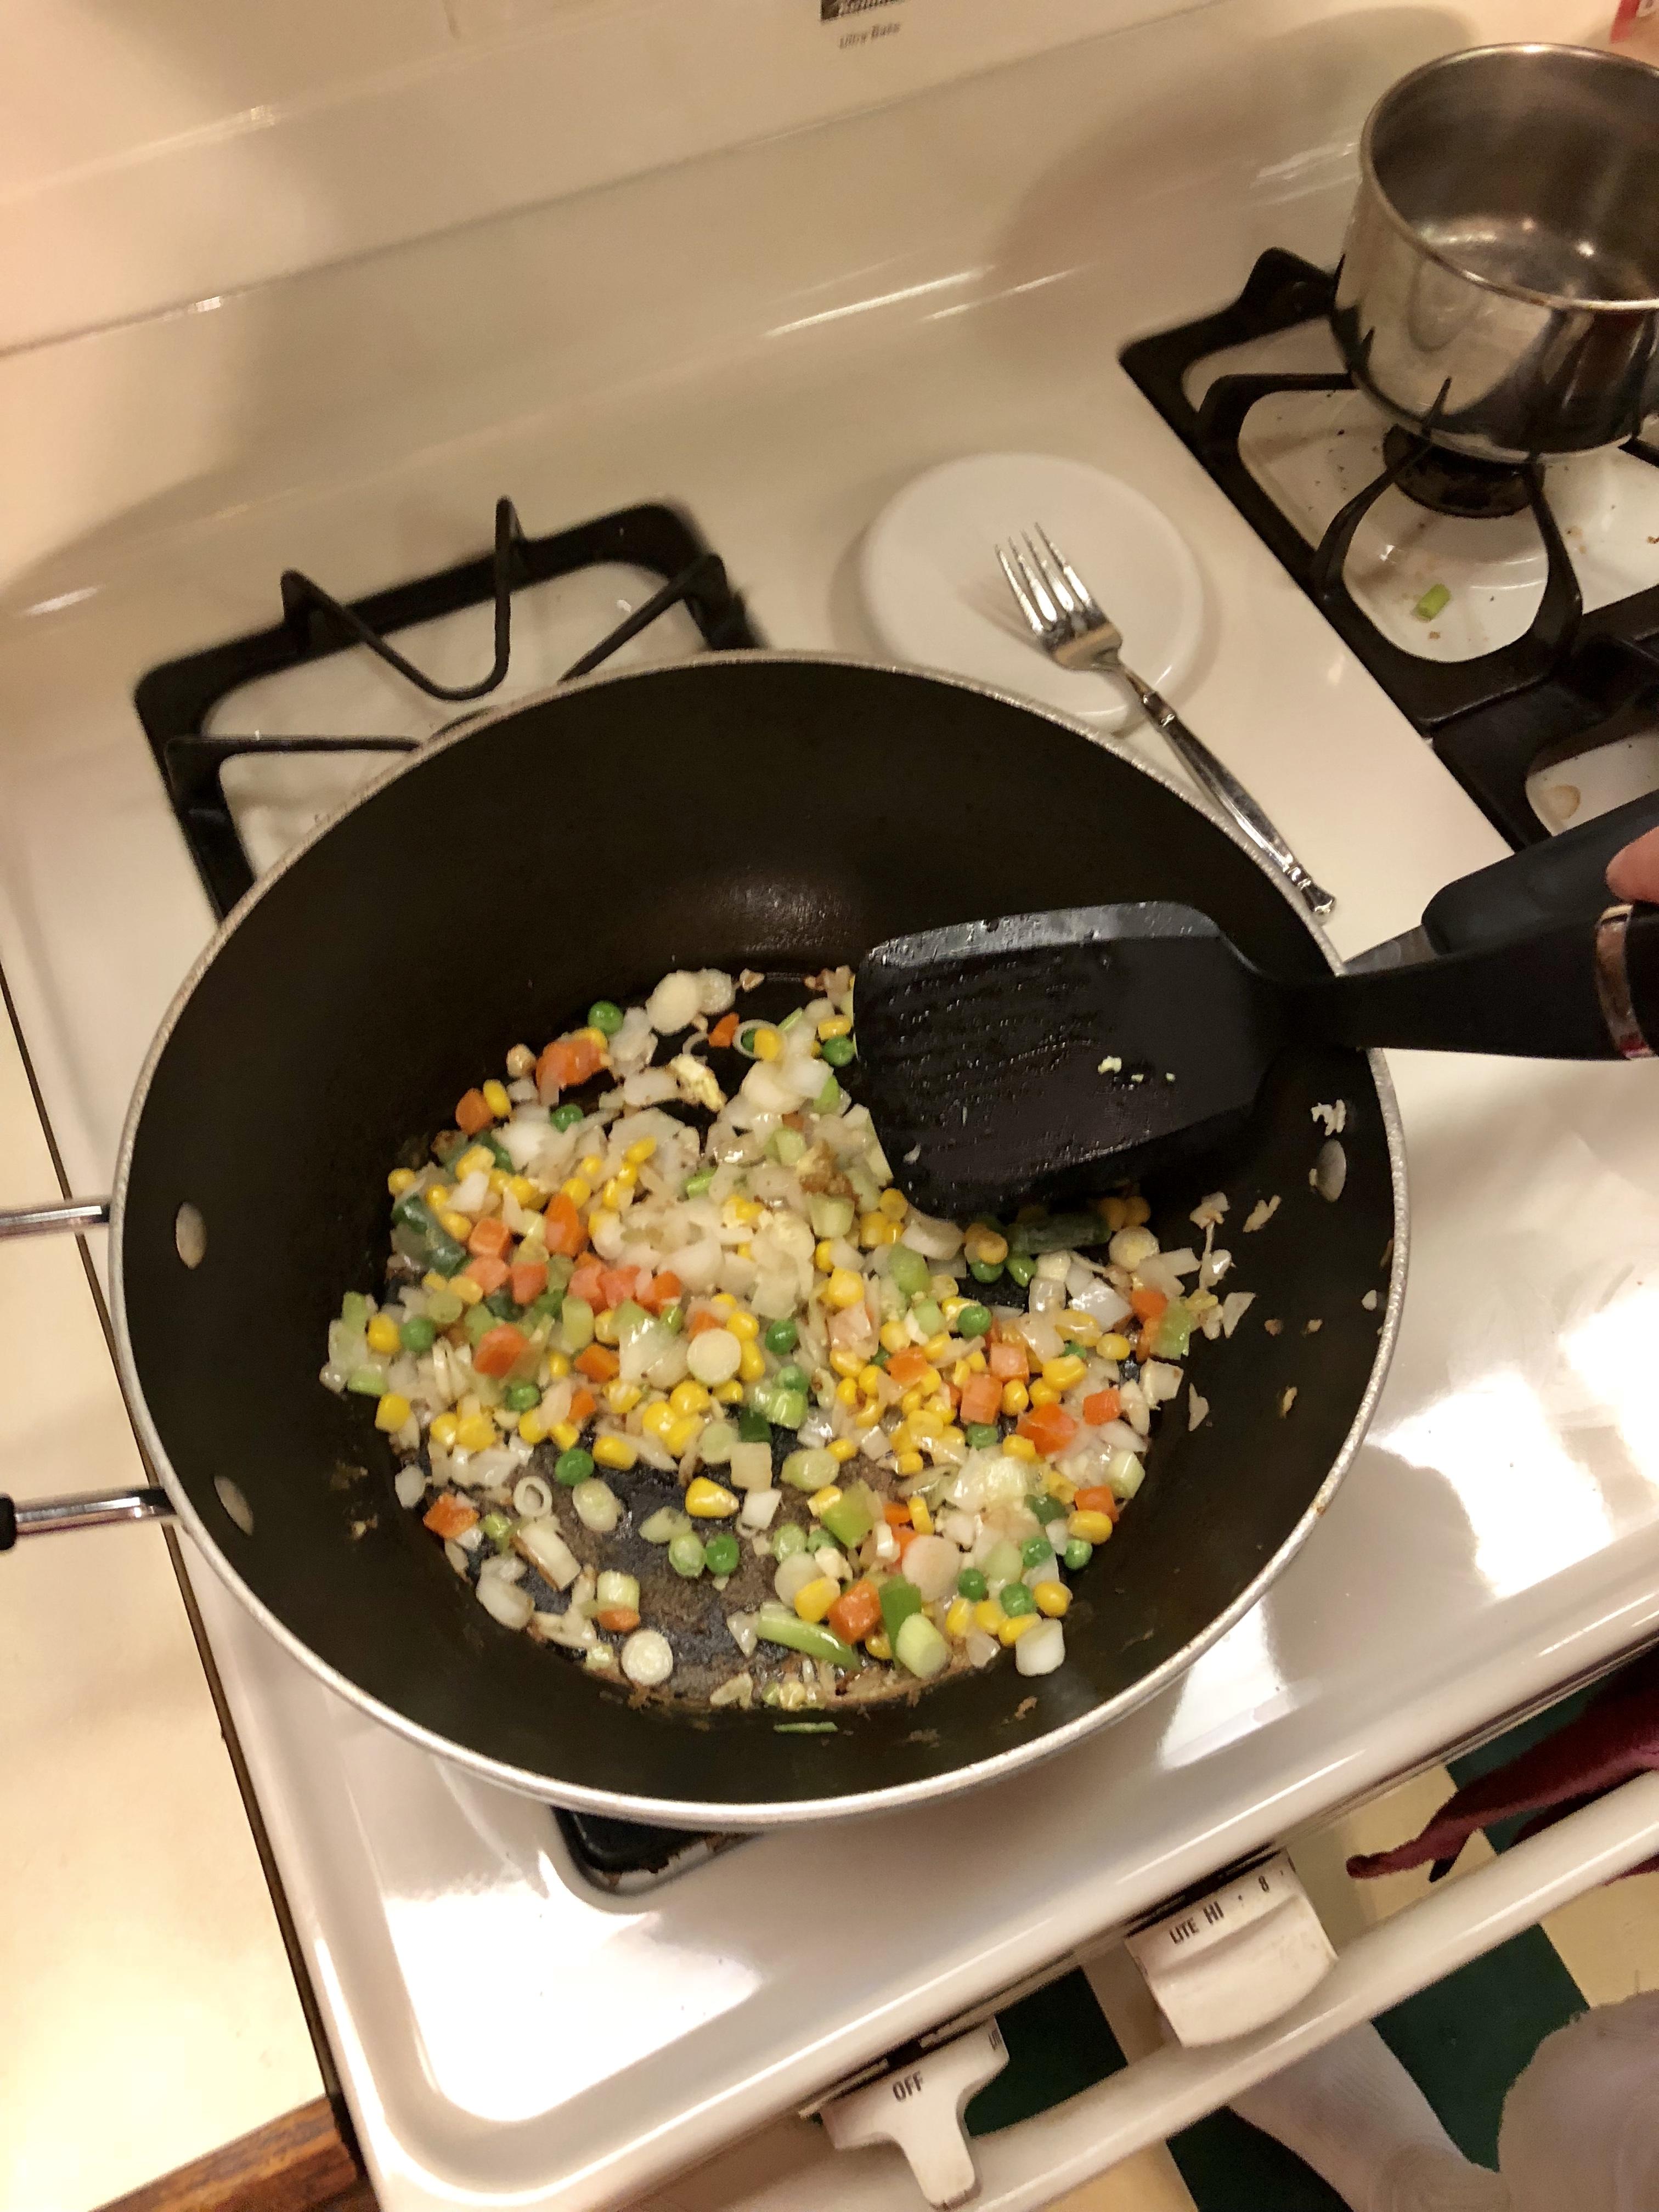 Weight Watchers Cauliflower Fried Rice 1 Smart Point per serving